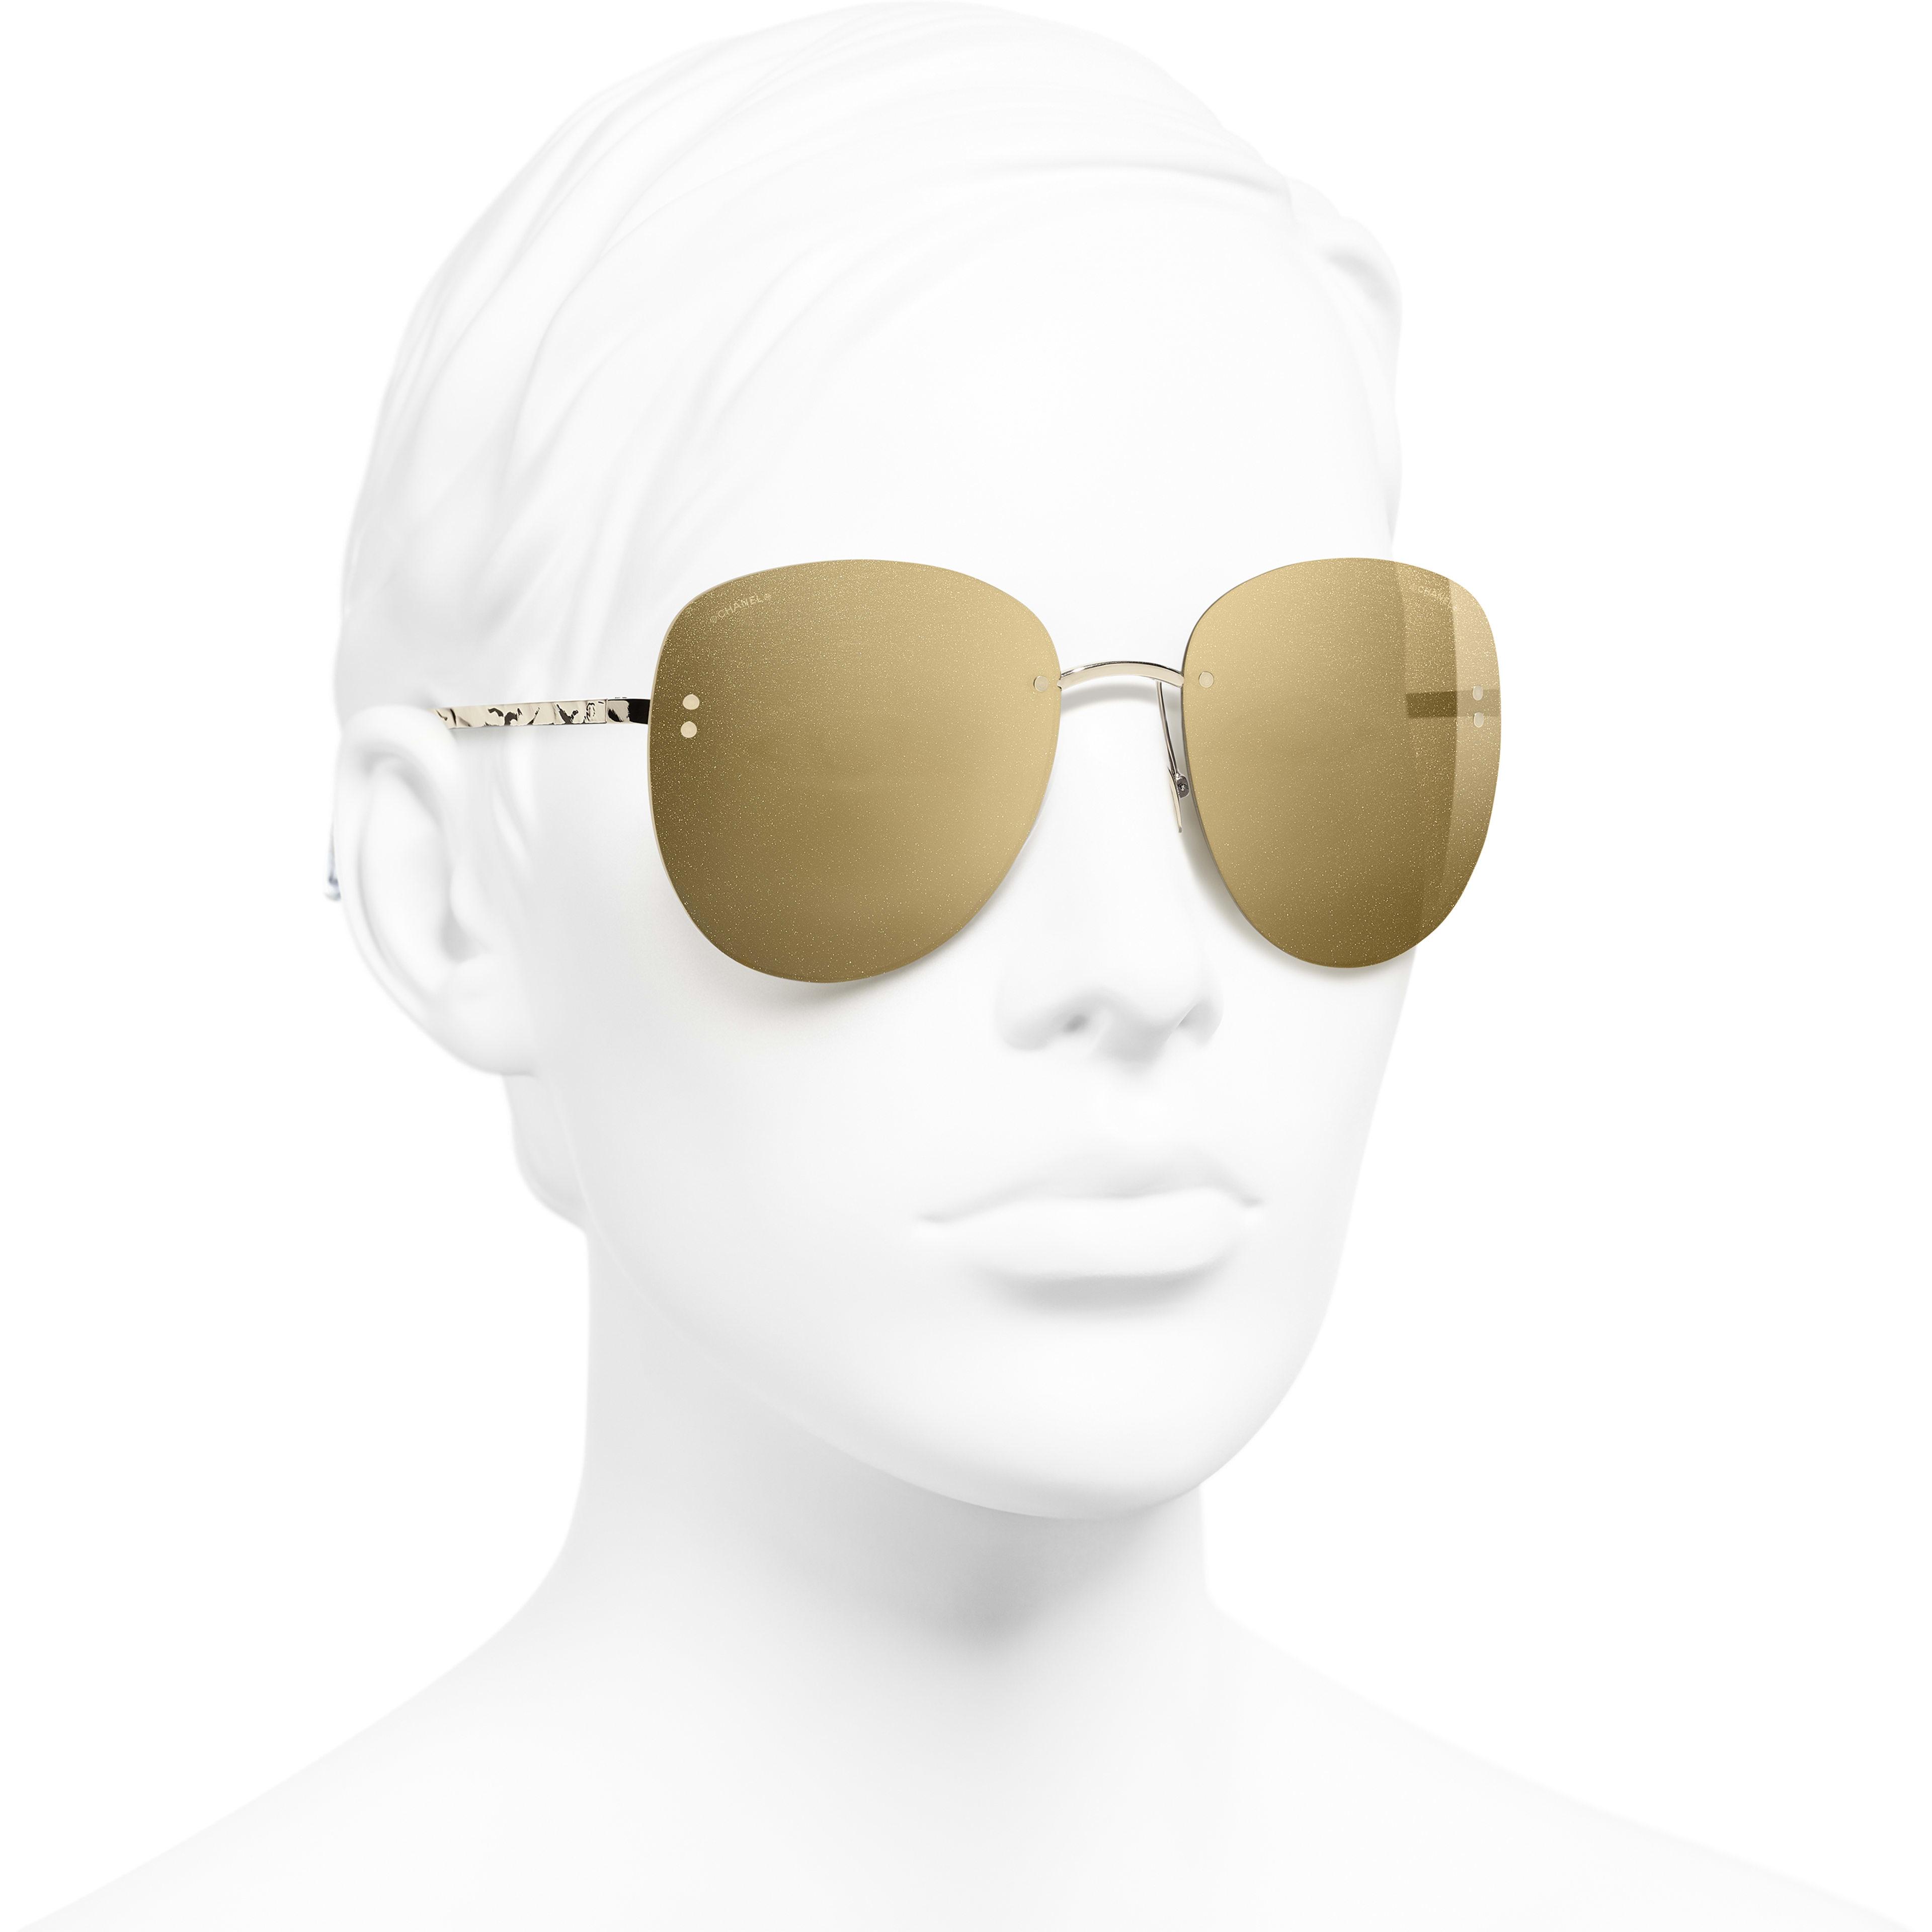 063aea35b2 ... Pilot Sunglasses - Gold - Metal - 18-Karat Gold Lenses - Worn 3